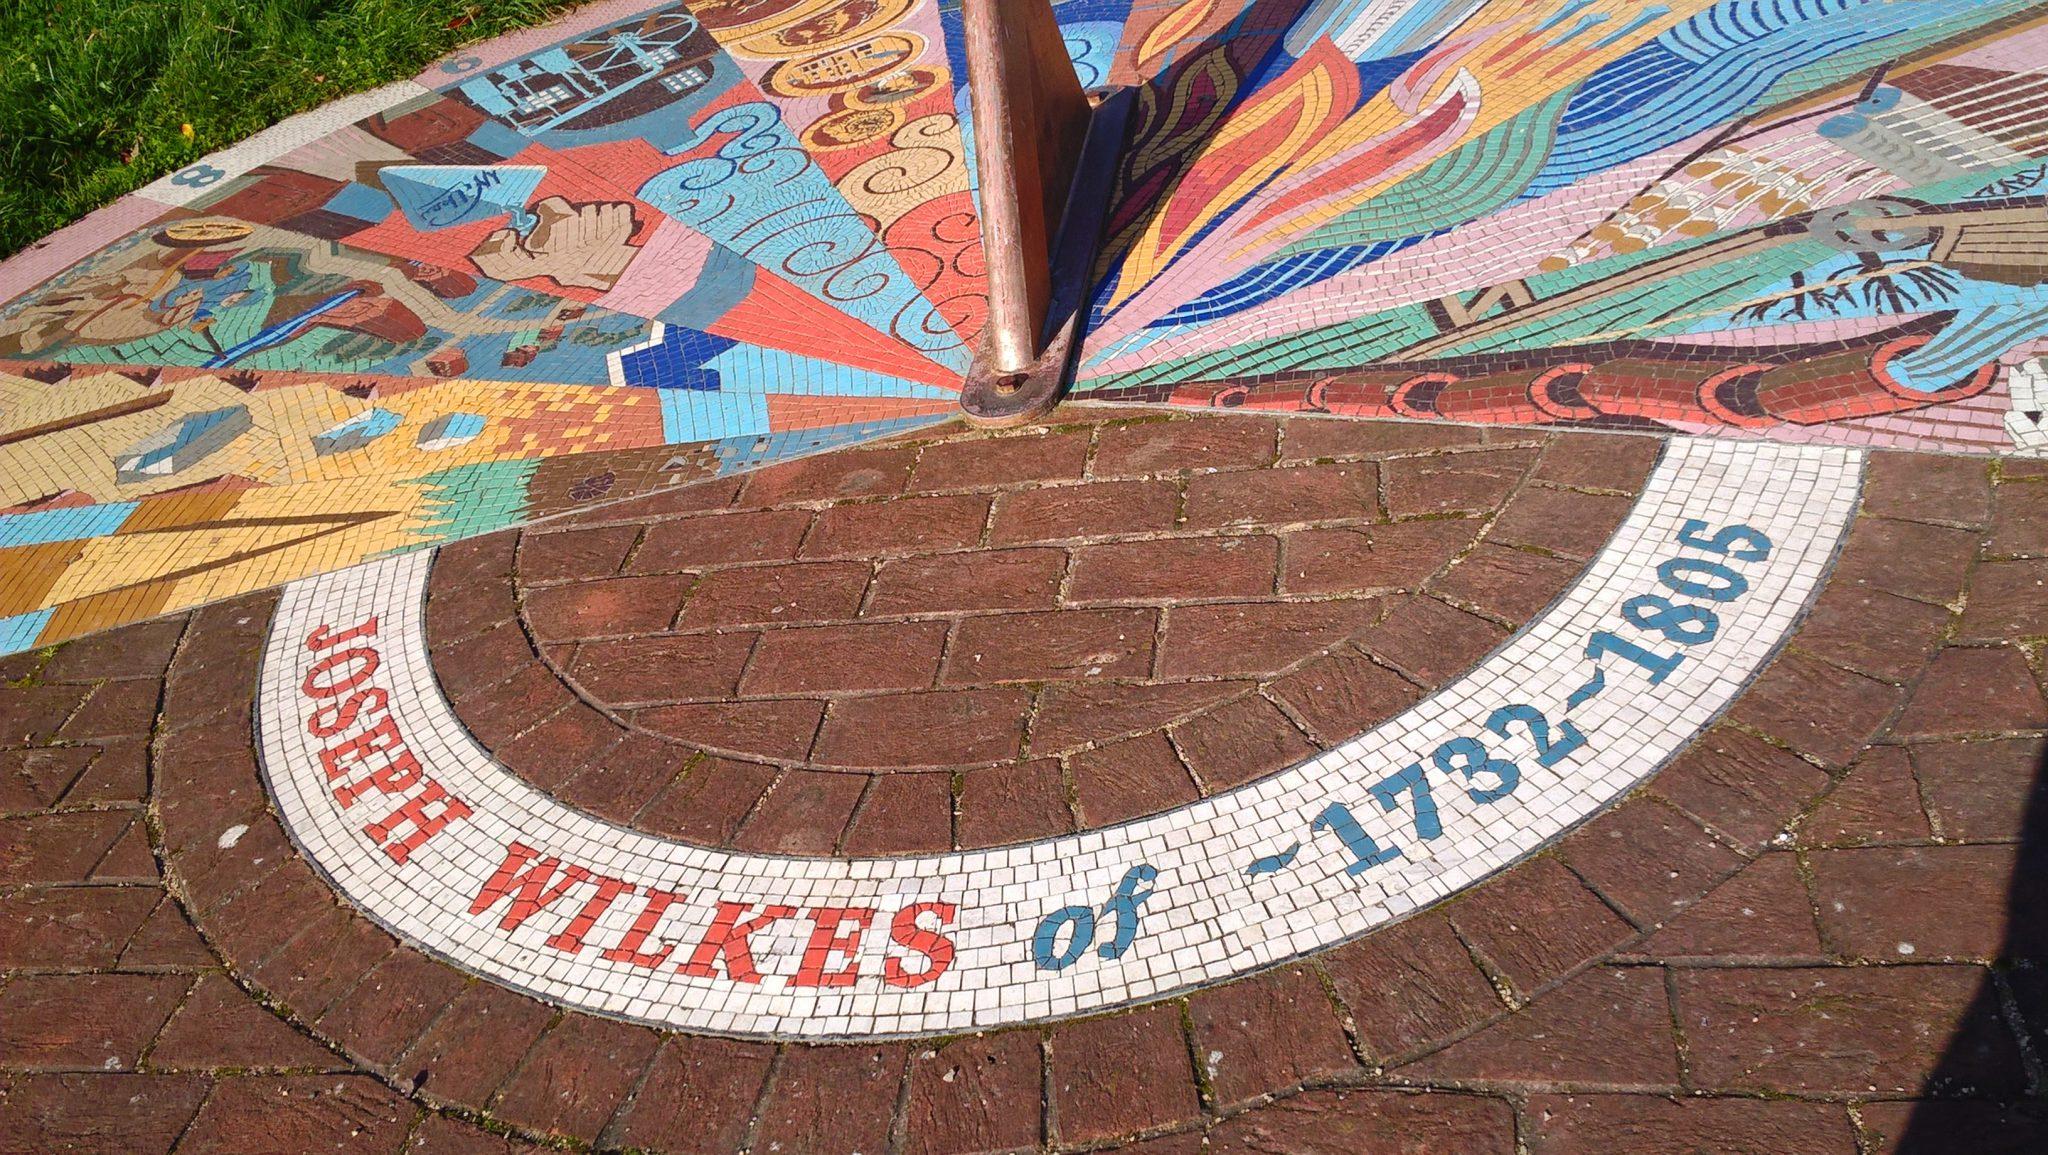 Photograph of the Joseph Wilkes sundial in Measham